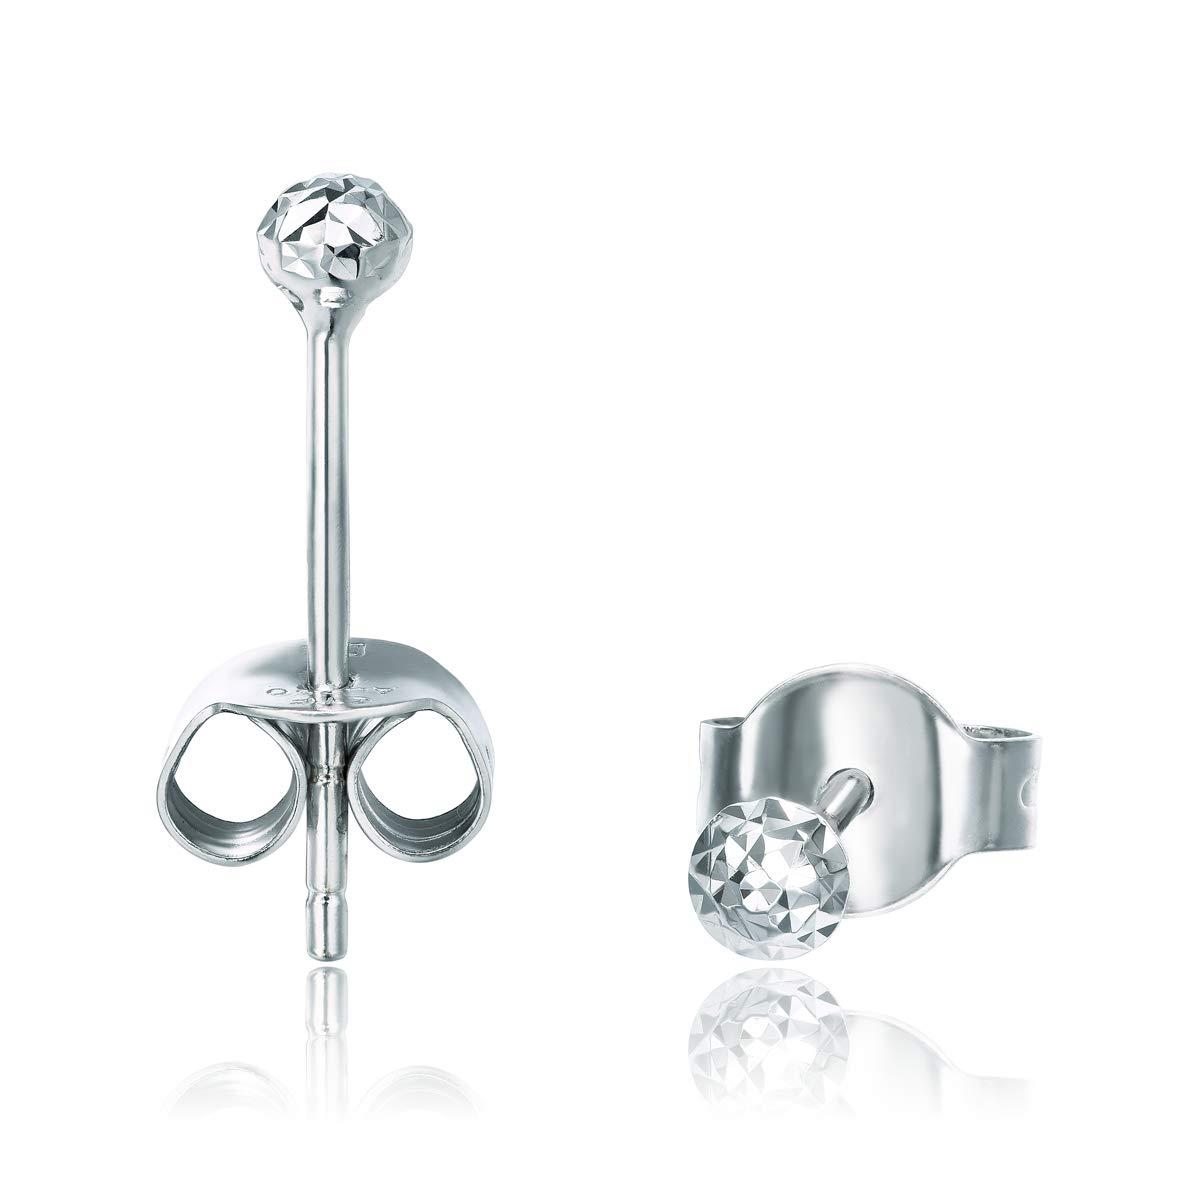 Chow Tai Fook 18K White Gold Petite Round Diamond Look Earrings